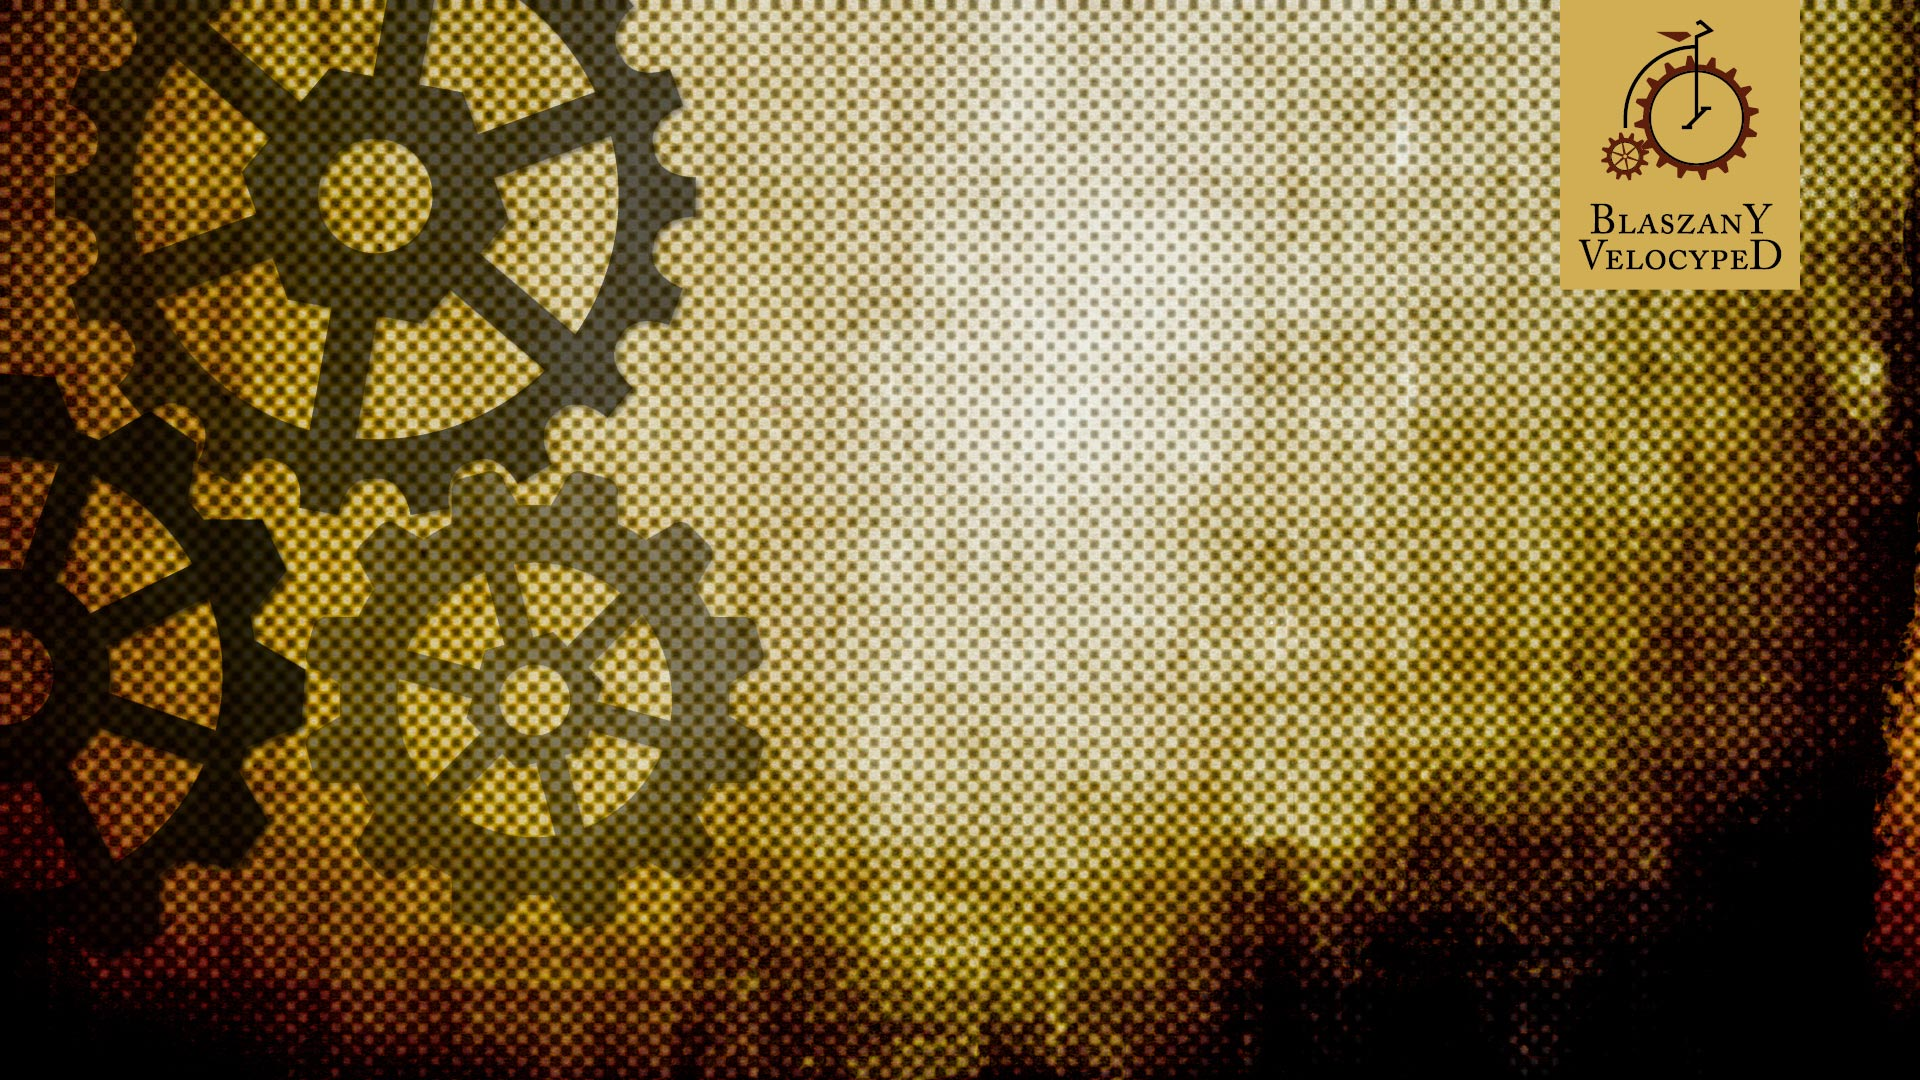 Steampunk wallpaper by Kurczak on DeviantArt